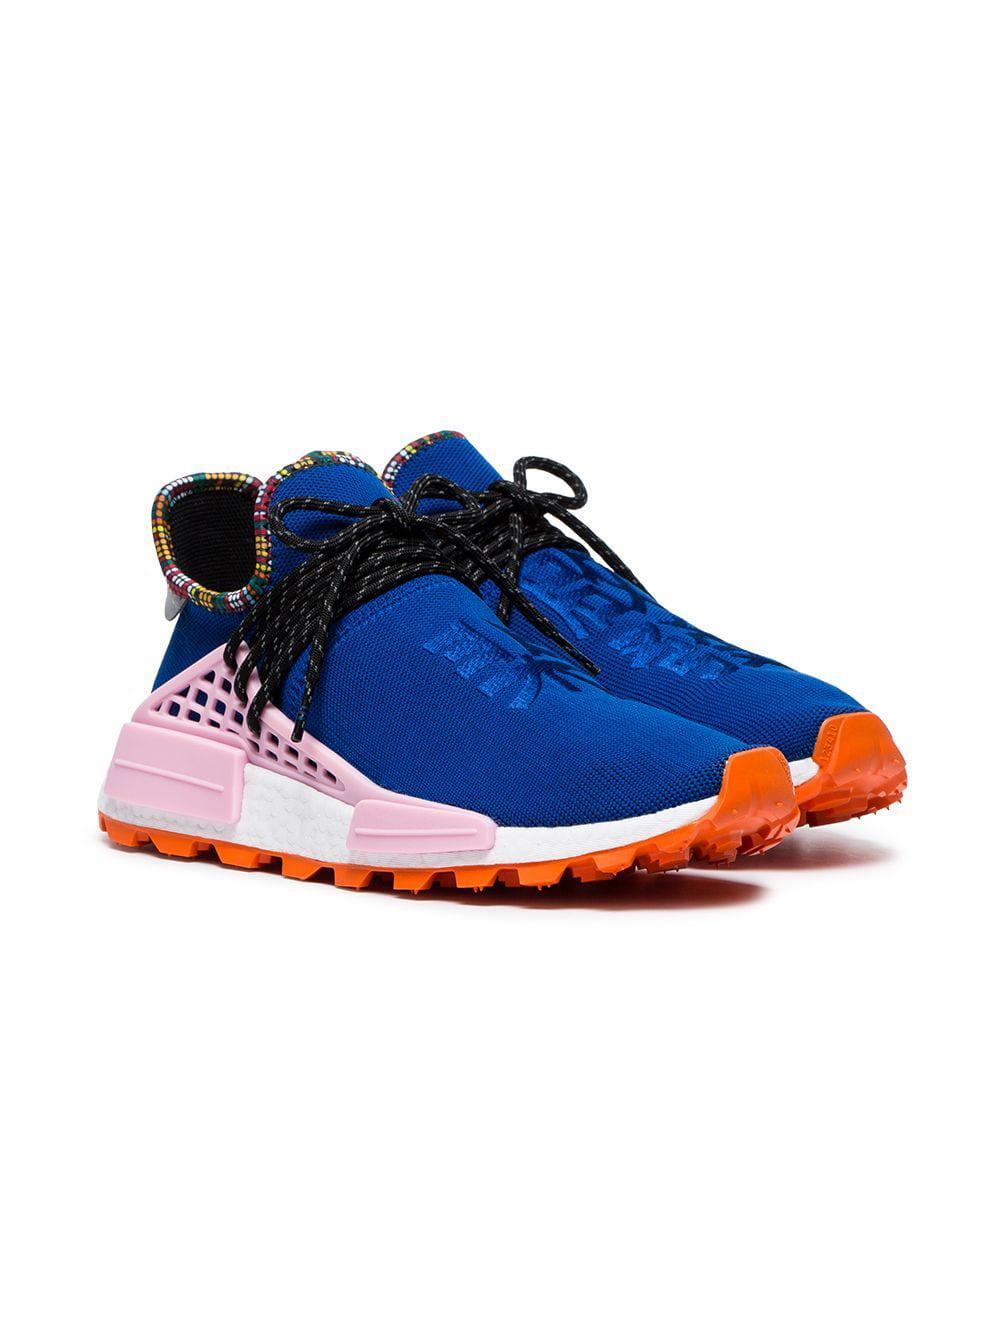 c68b3e796 ... Pharrell Williams Blue Human Body Nmd Sneakers for Men - Lyst. View  fullscreen